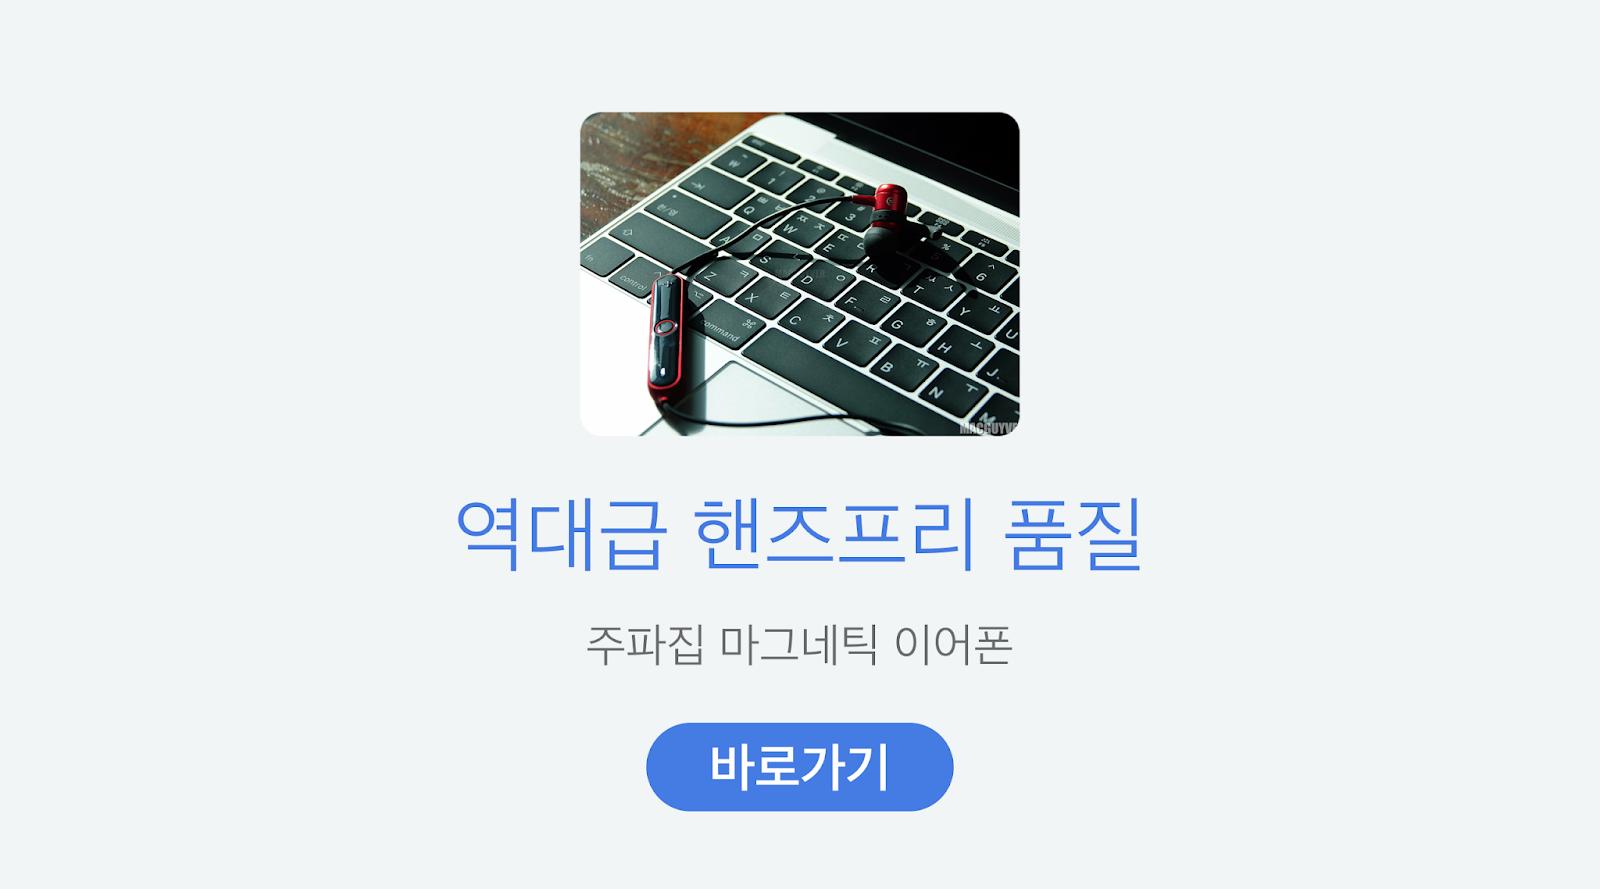 http://smartstore.naver.com/jupazip/products/2603323977